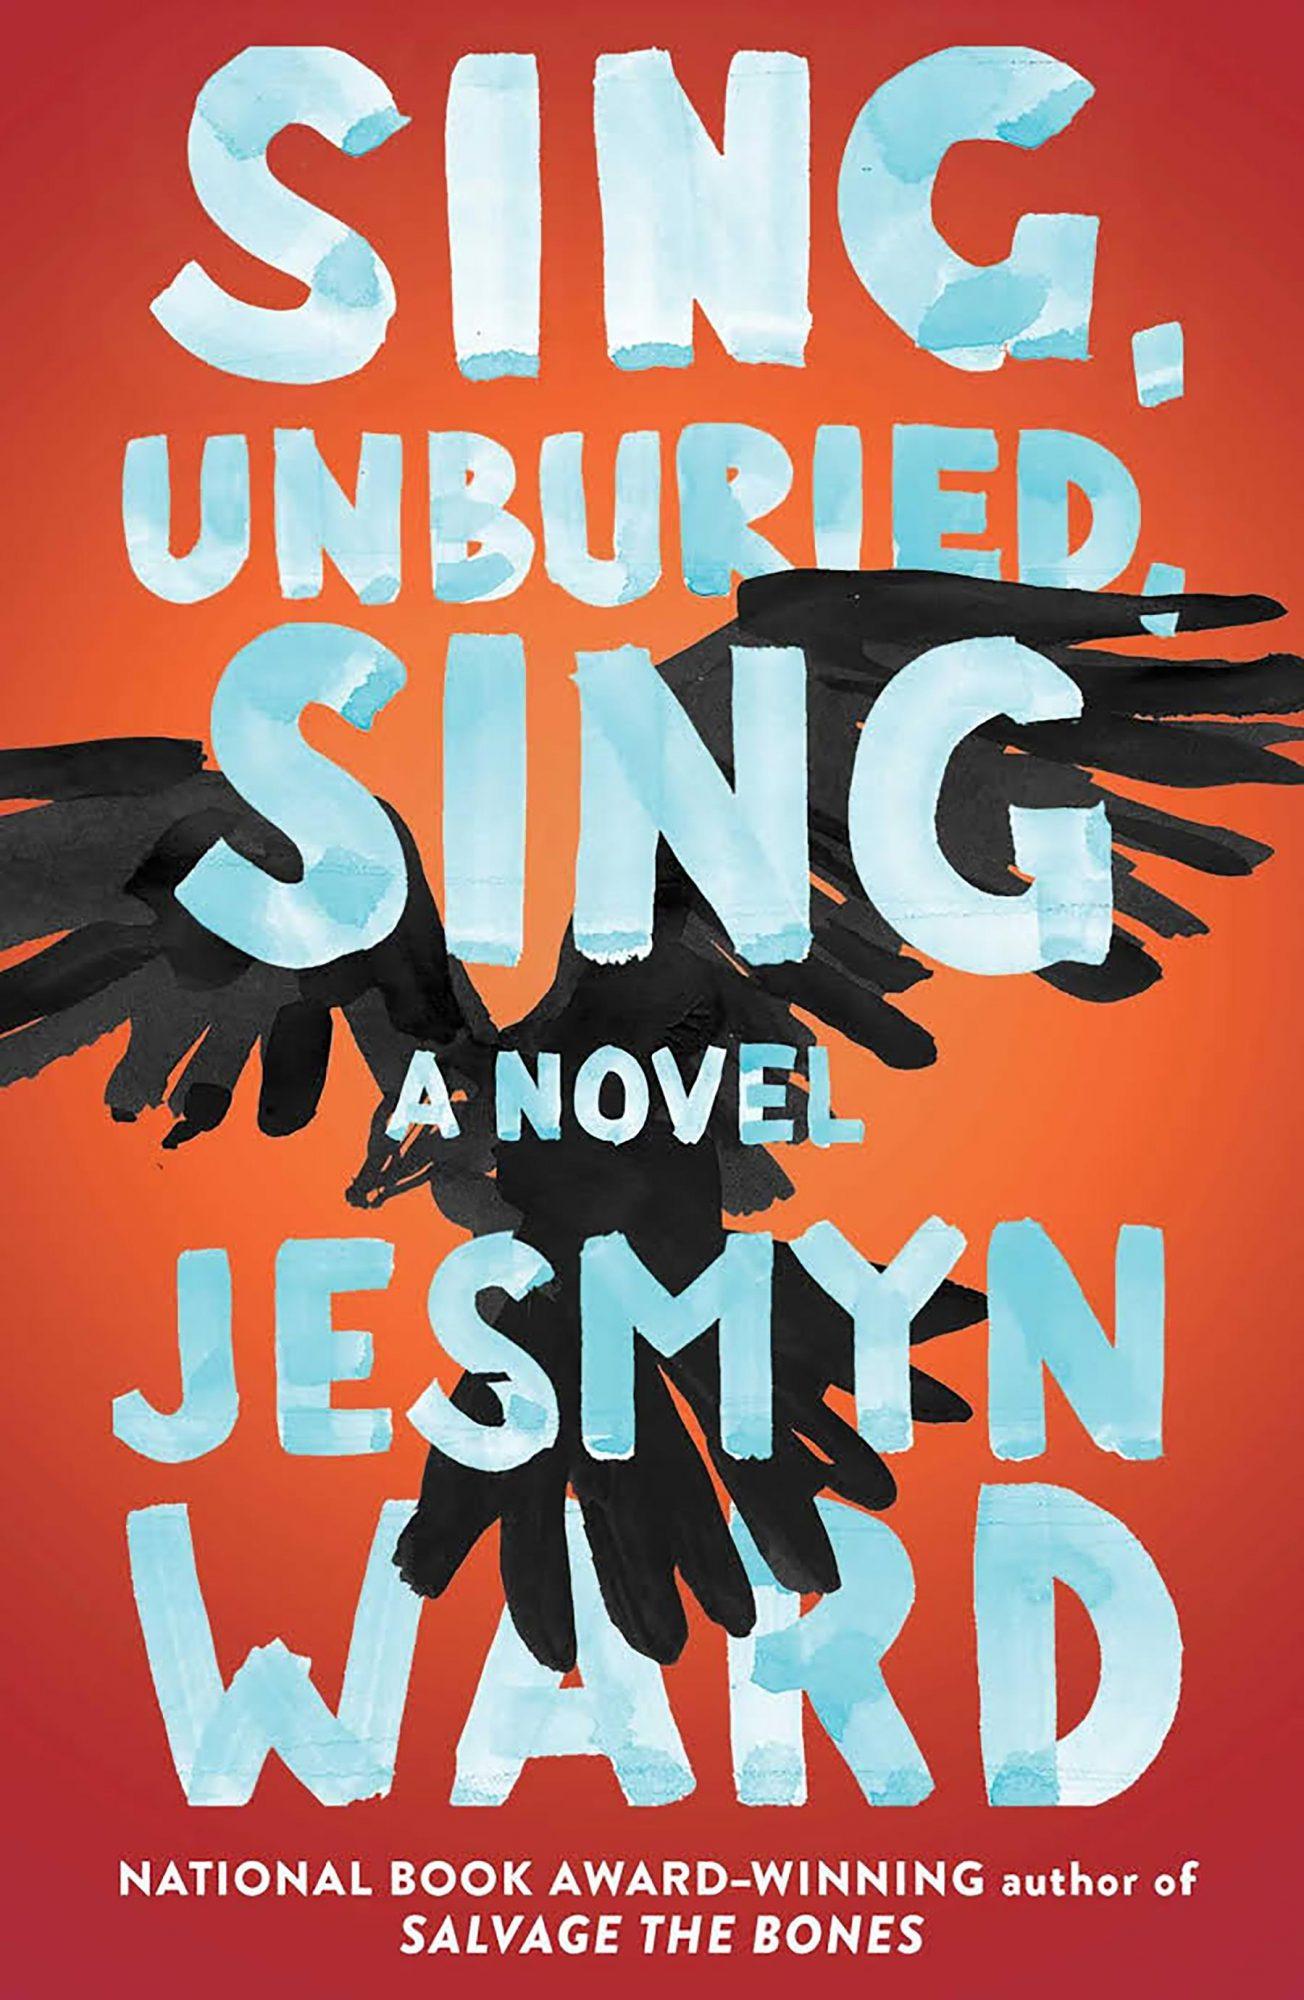 Jesmyn Ward, Sing, Unburied, Sing CR: Simon and Schuster